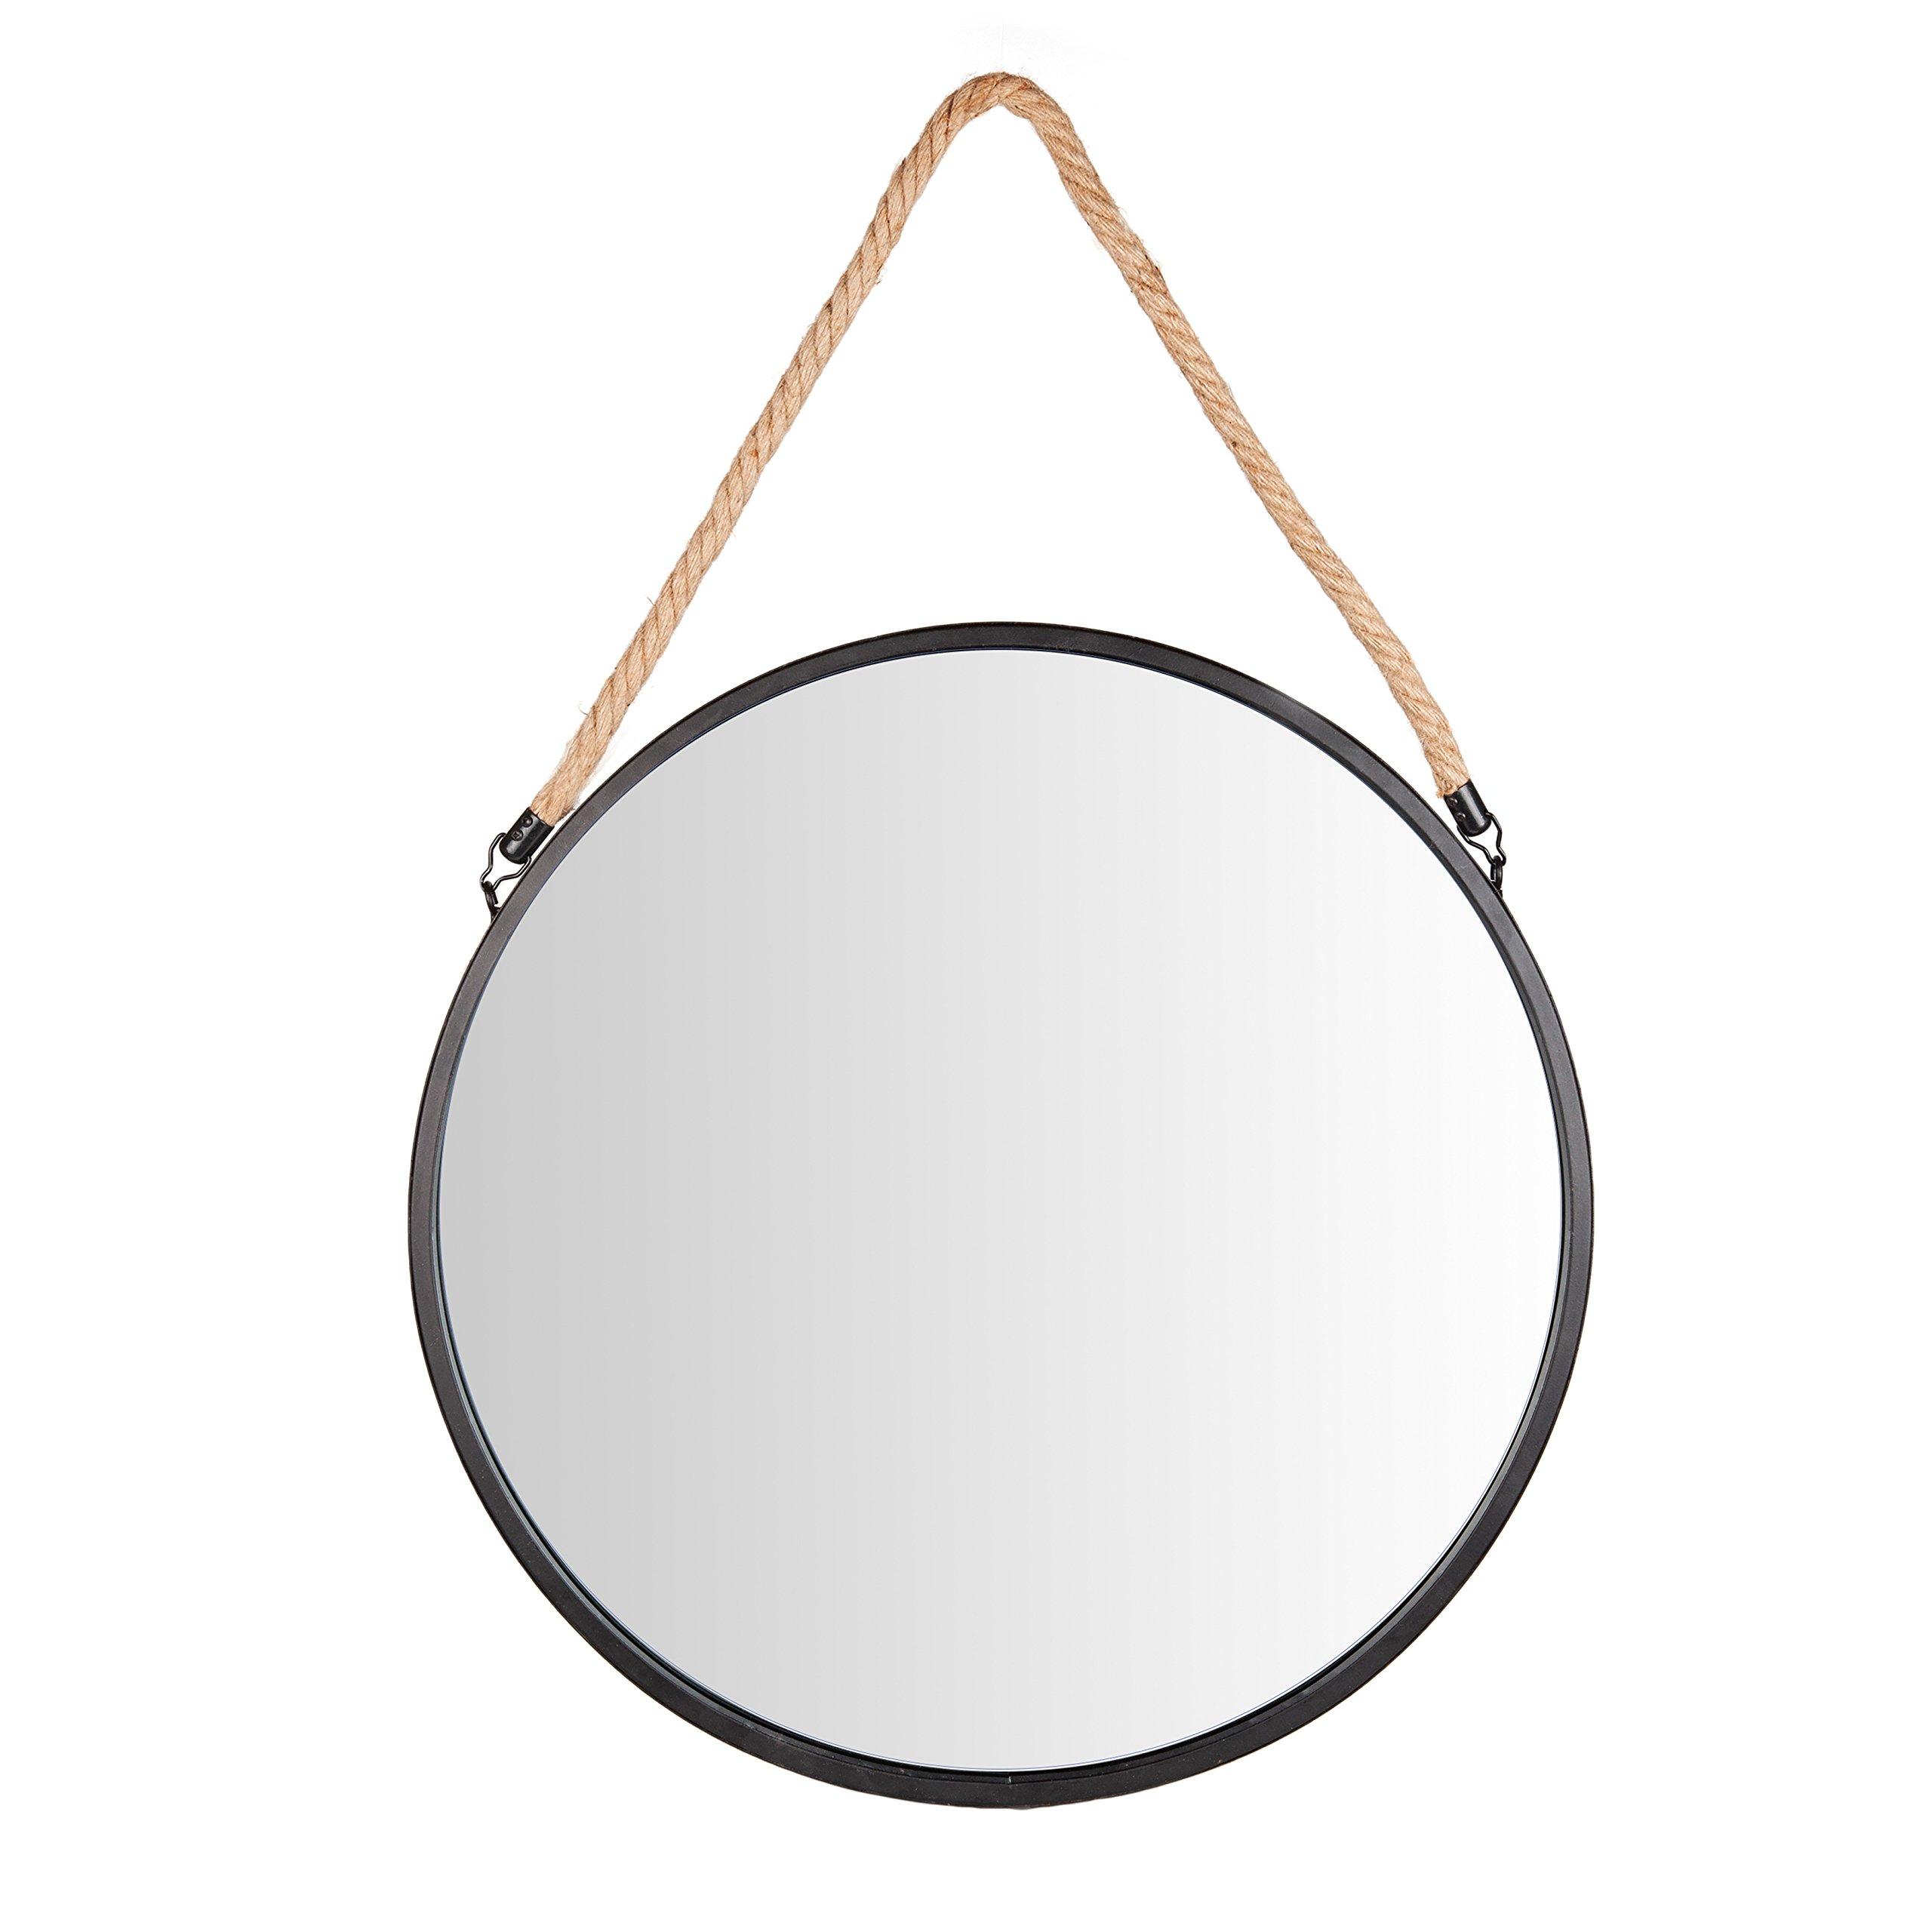 Danya B. SE001 Framed 20'' Decorative Round Black Metal Circle Wall Mirror with Hanging Rope